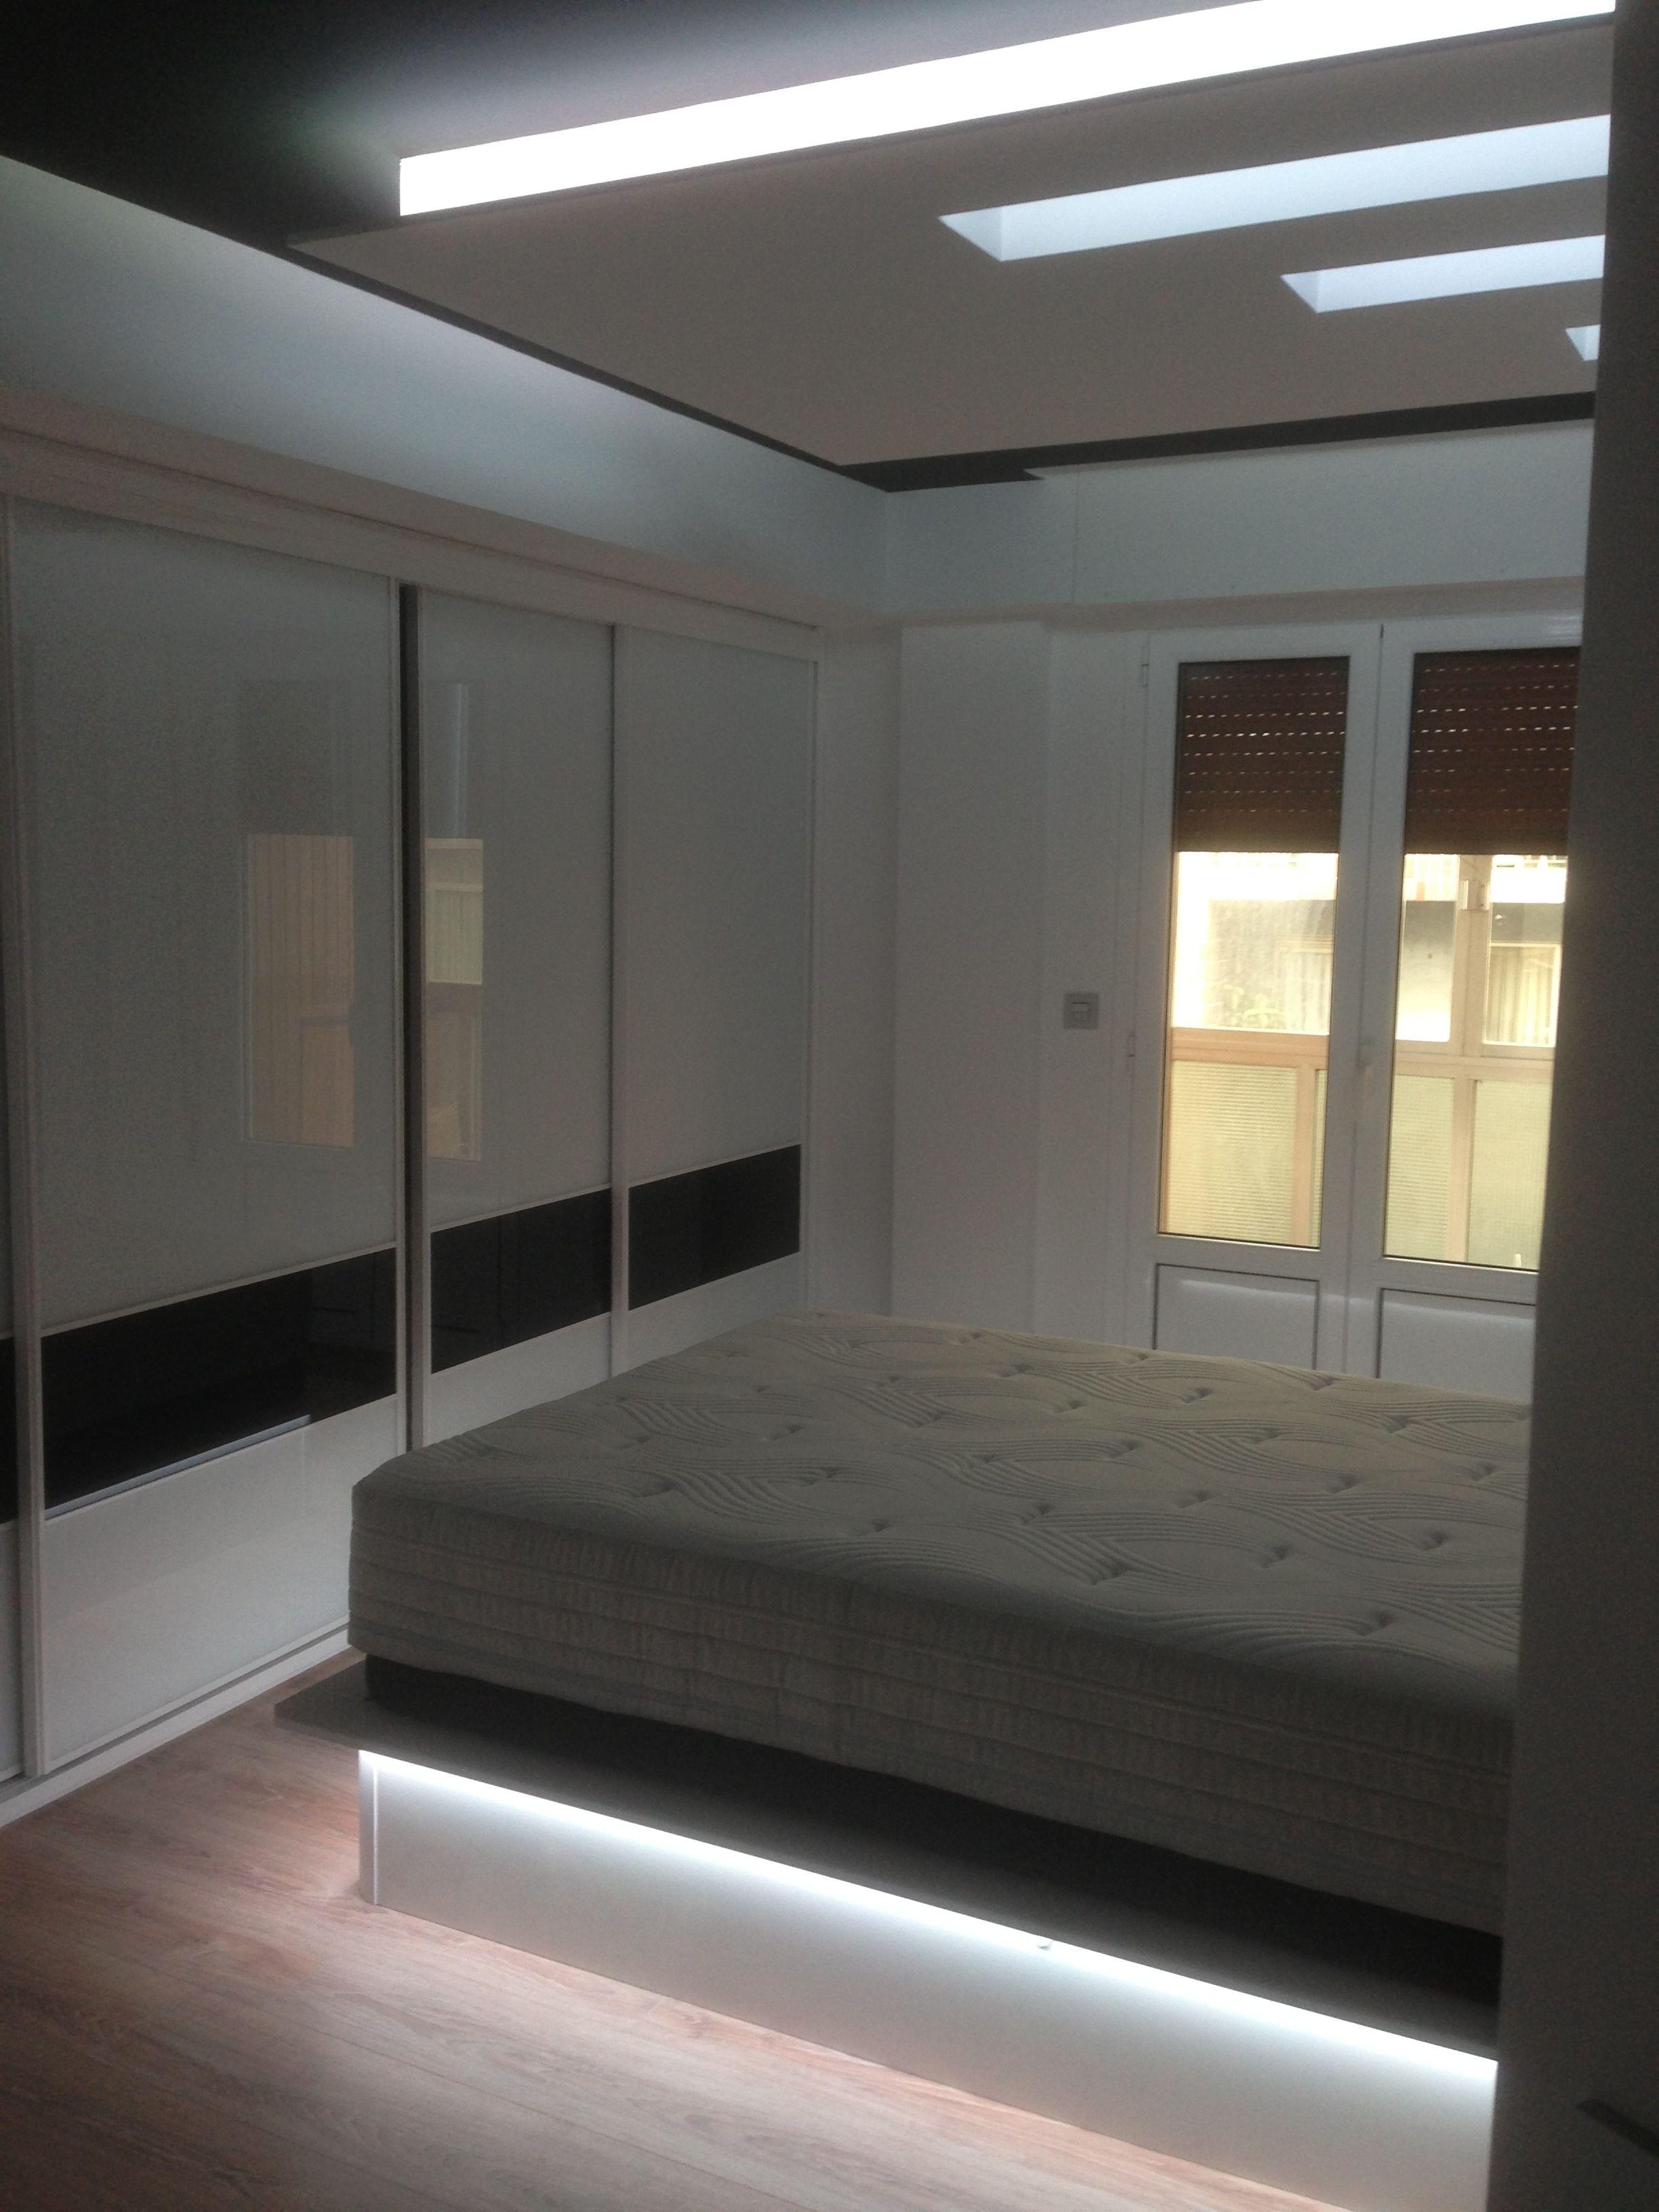 Canap Y Foseado De Dormitorio Iluminados Con Tira De Leds